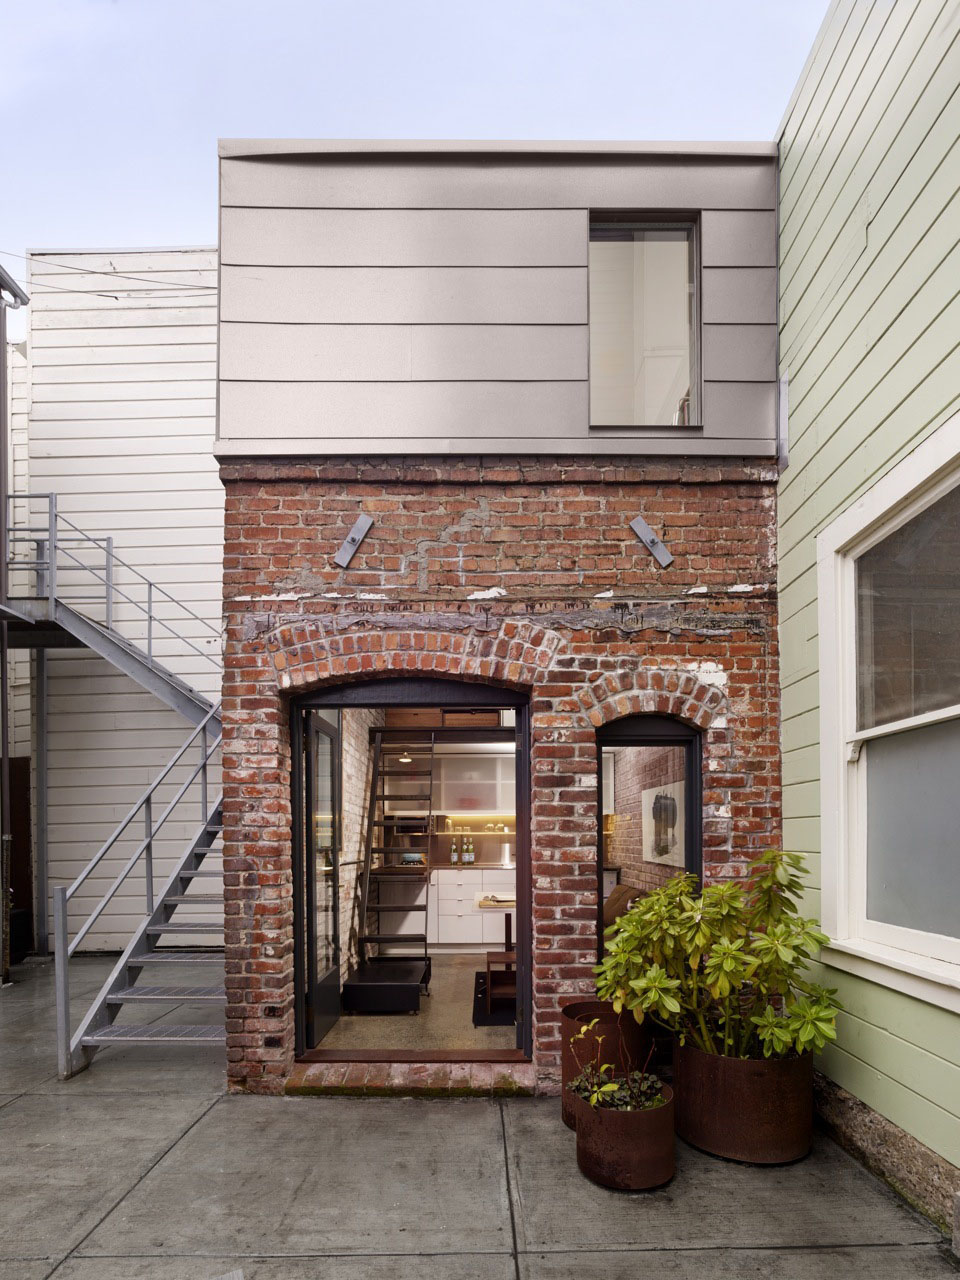 Square Foot Micro Apartment In A Tiny Brick House - Loft apartment brick